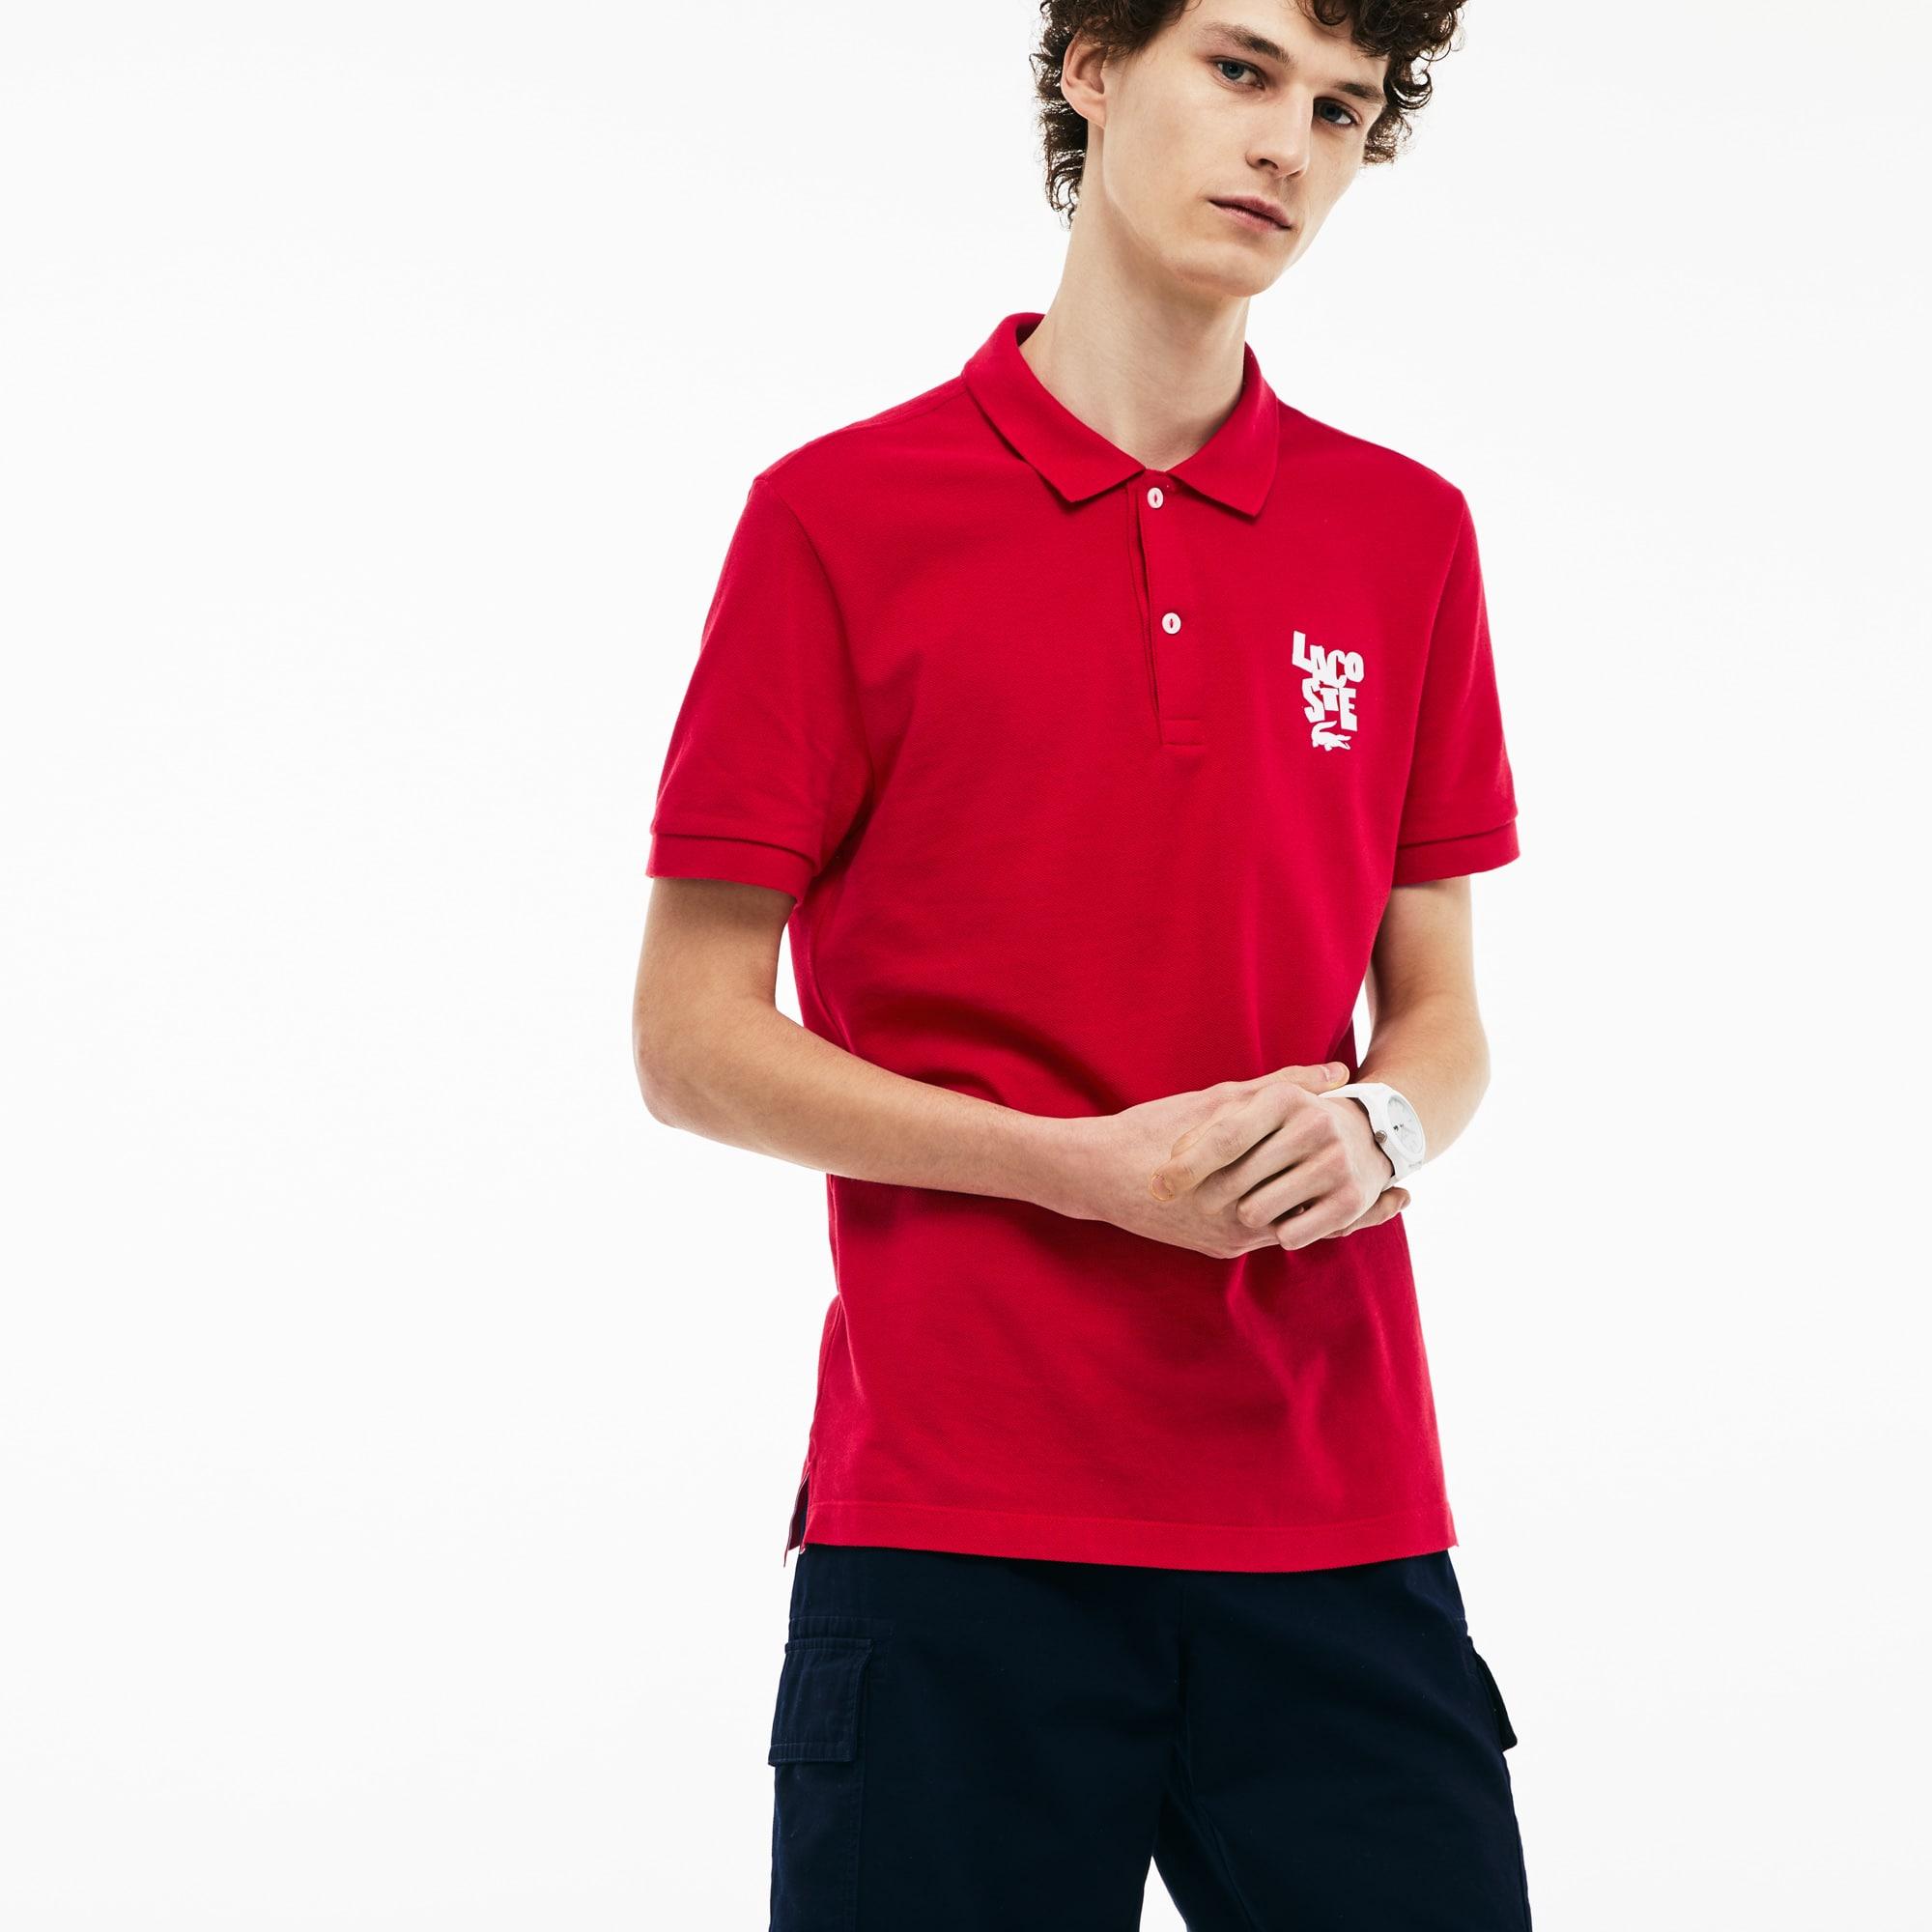 Herren Regular Fit Poloshirt mit LACOSTE Schriftzug